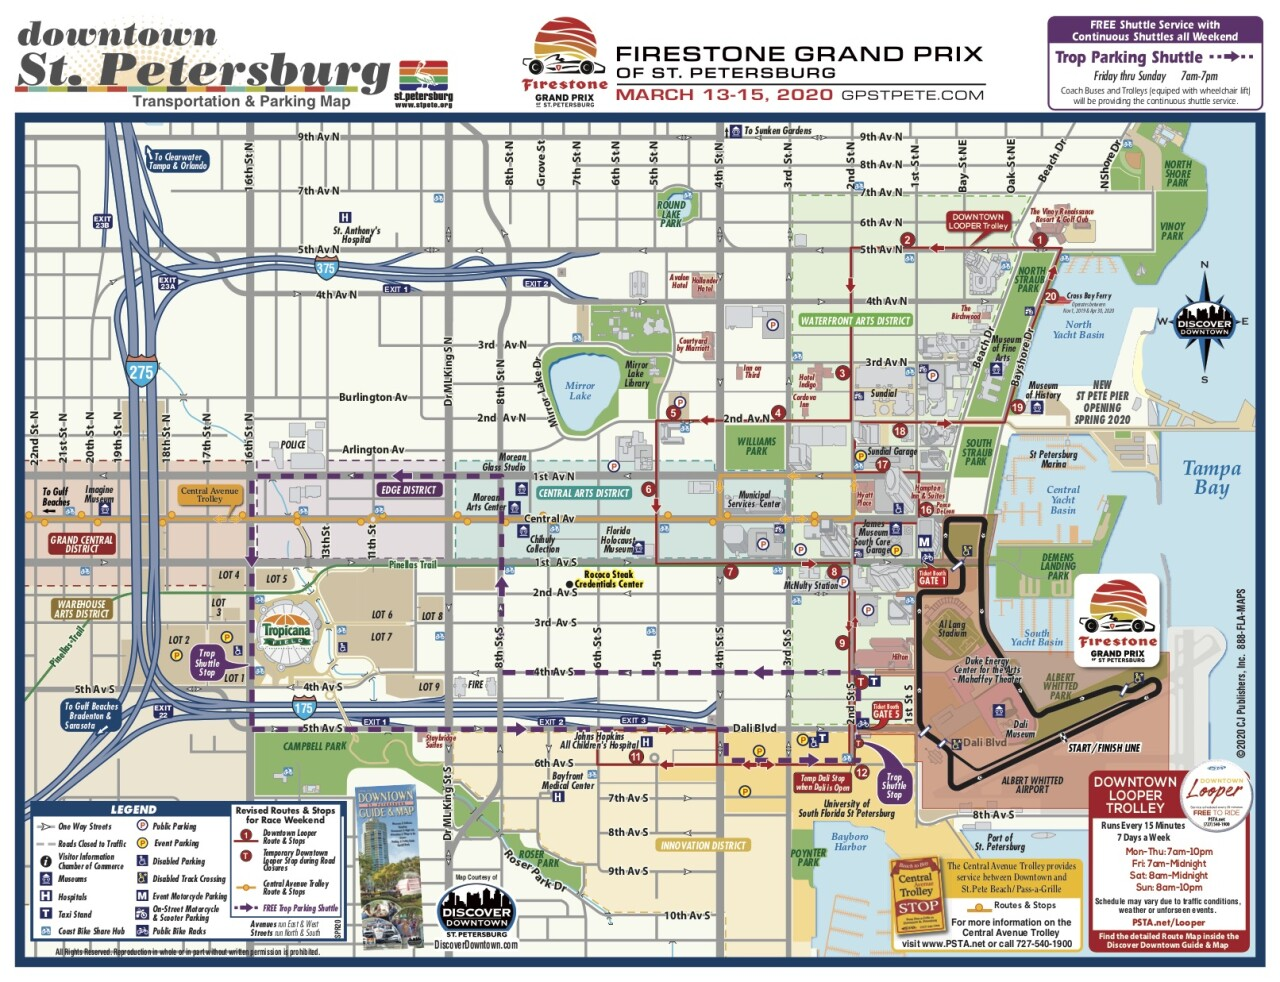 DT St.Pete Map-Grand Prix 2020.jpg